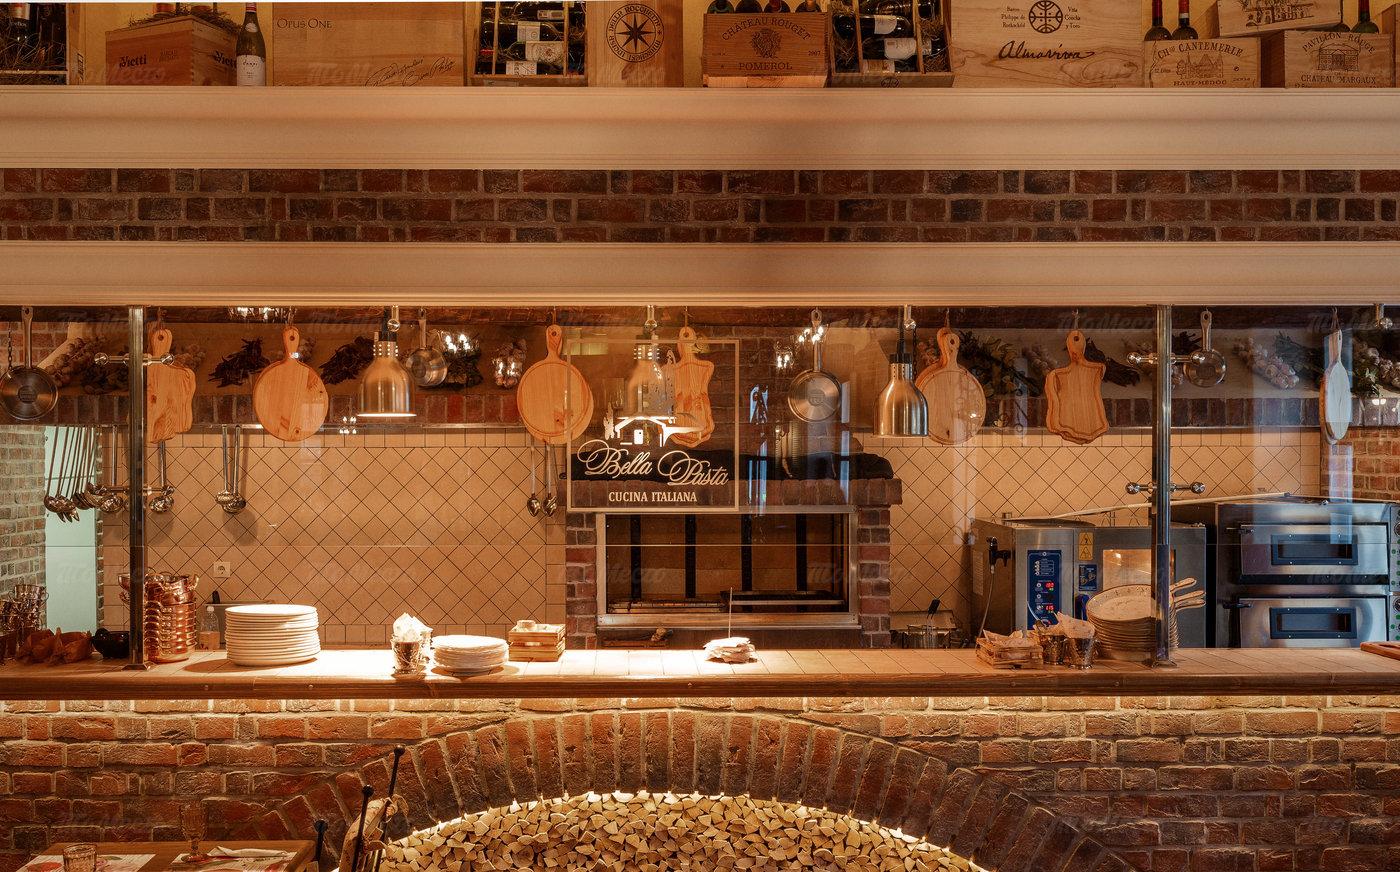 bella pasta солянка bella pasta на Солянке Италию на зубок. Ресторан Bella Pasta на Солянке restoran bella pasta bella pasta na ulitse solyanka 4a3f6 full 68998